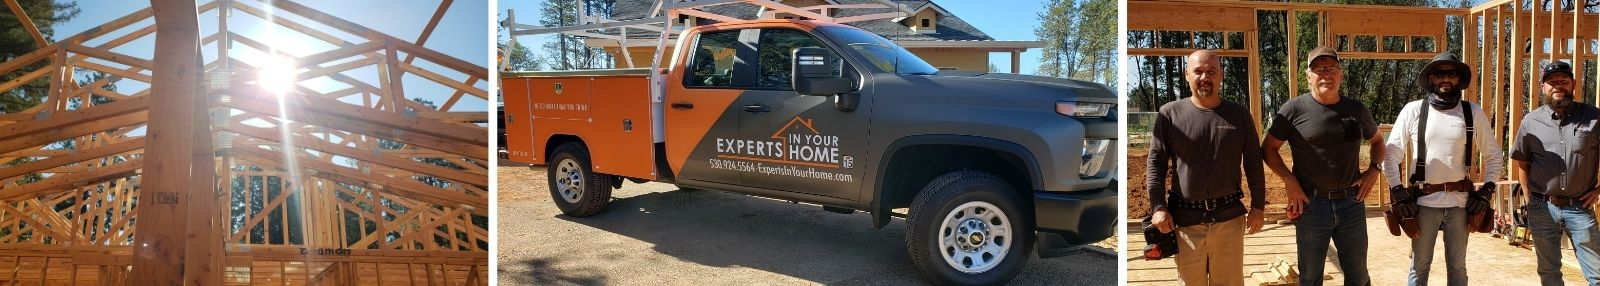 Experts remodeling page header 2020